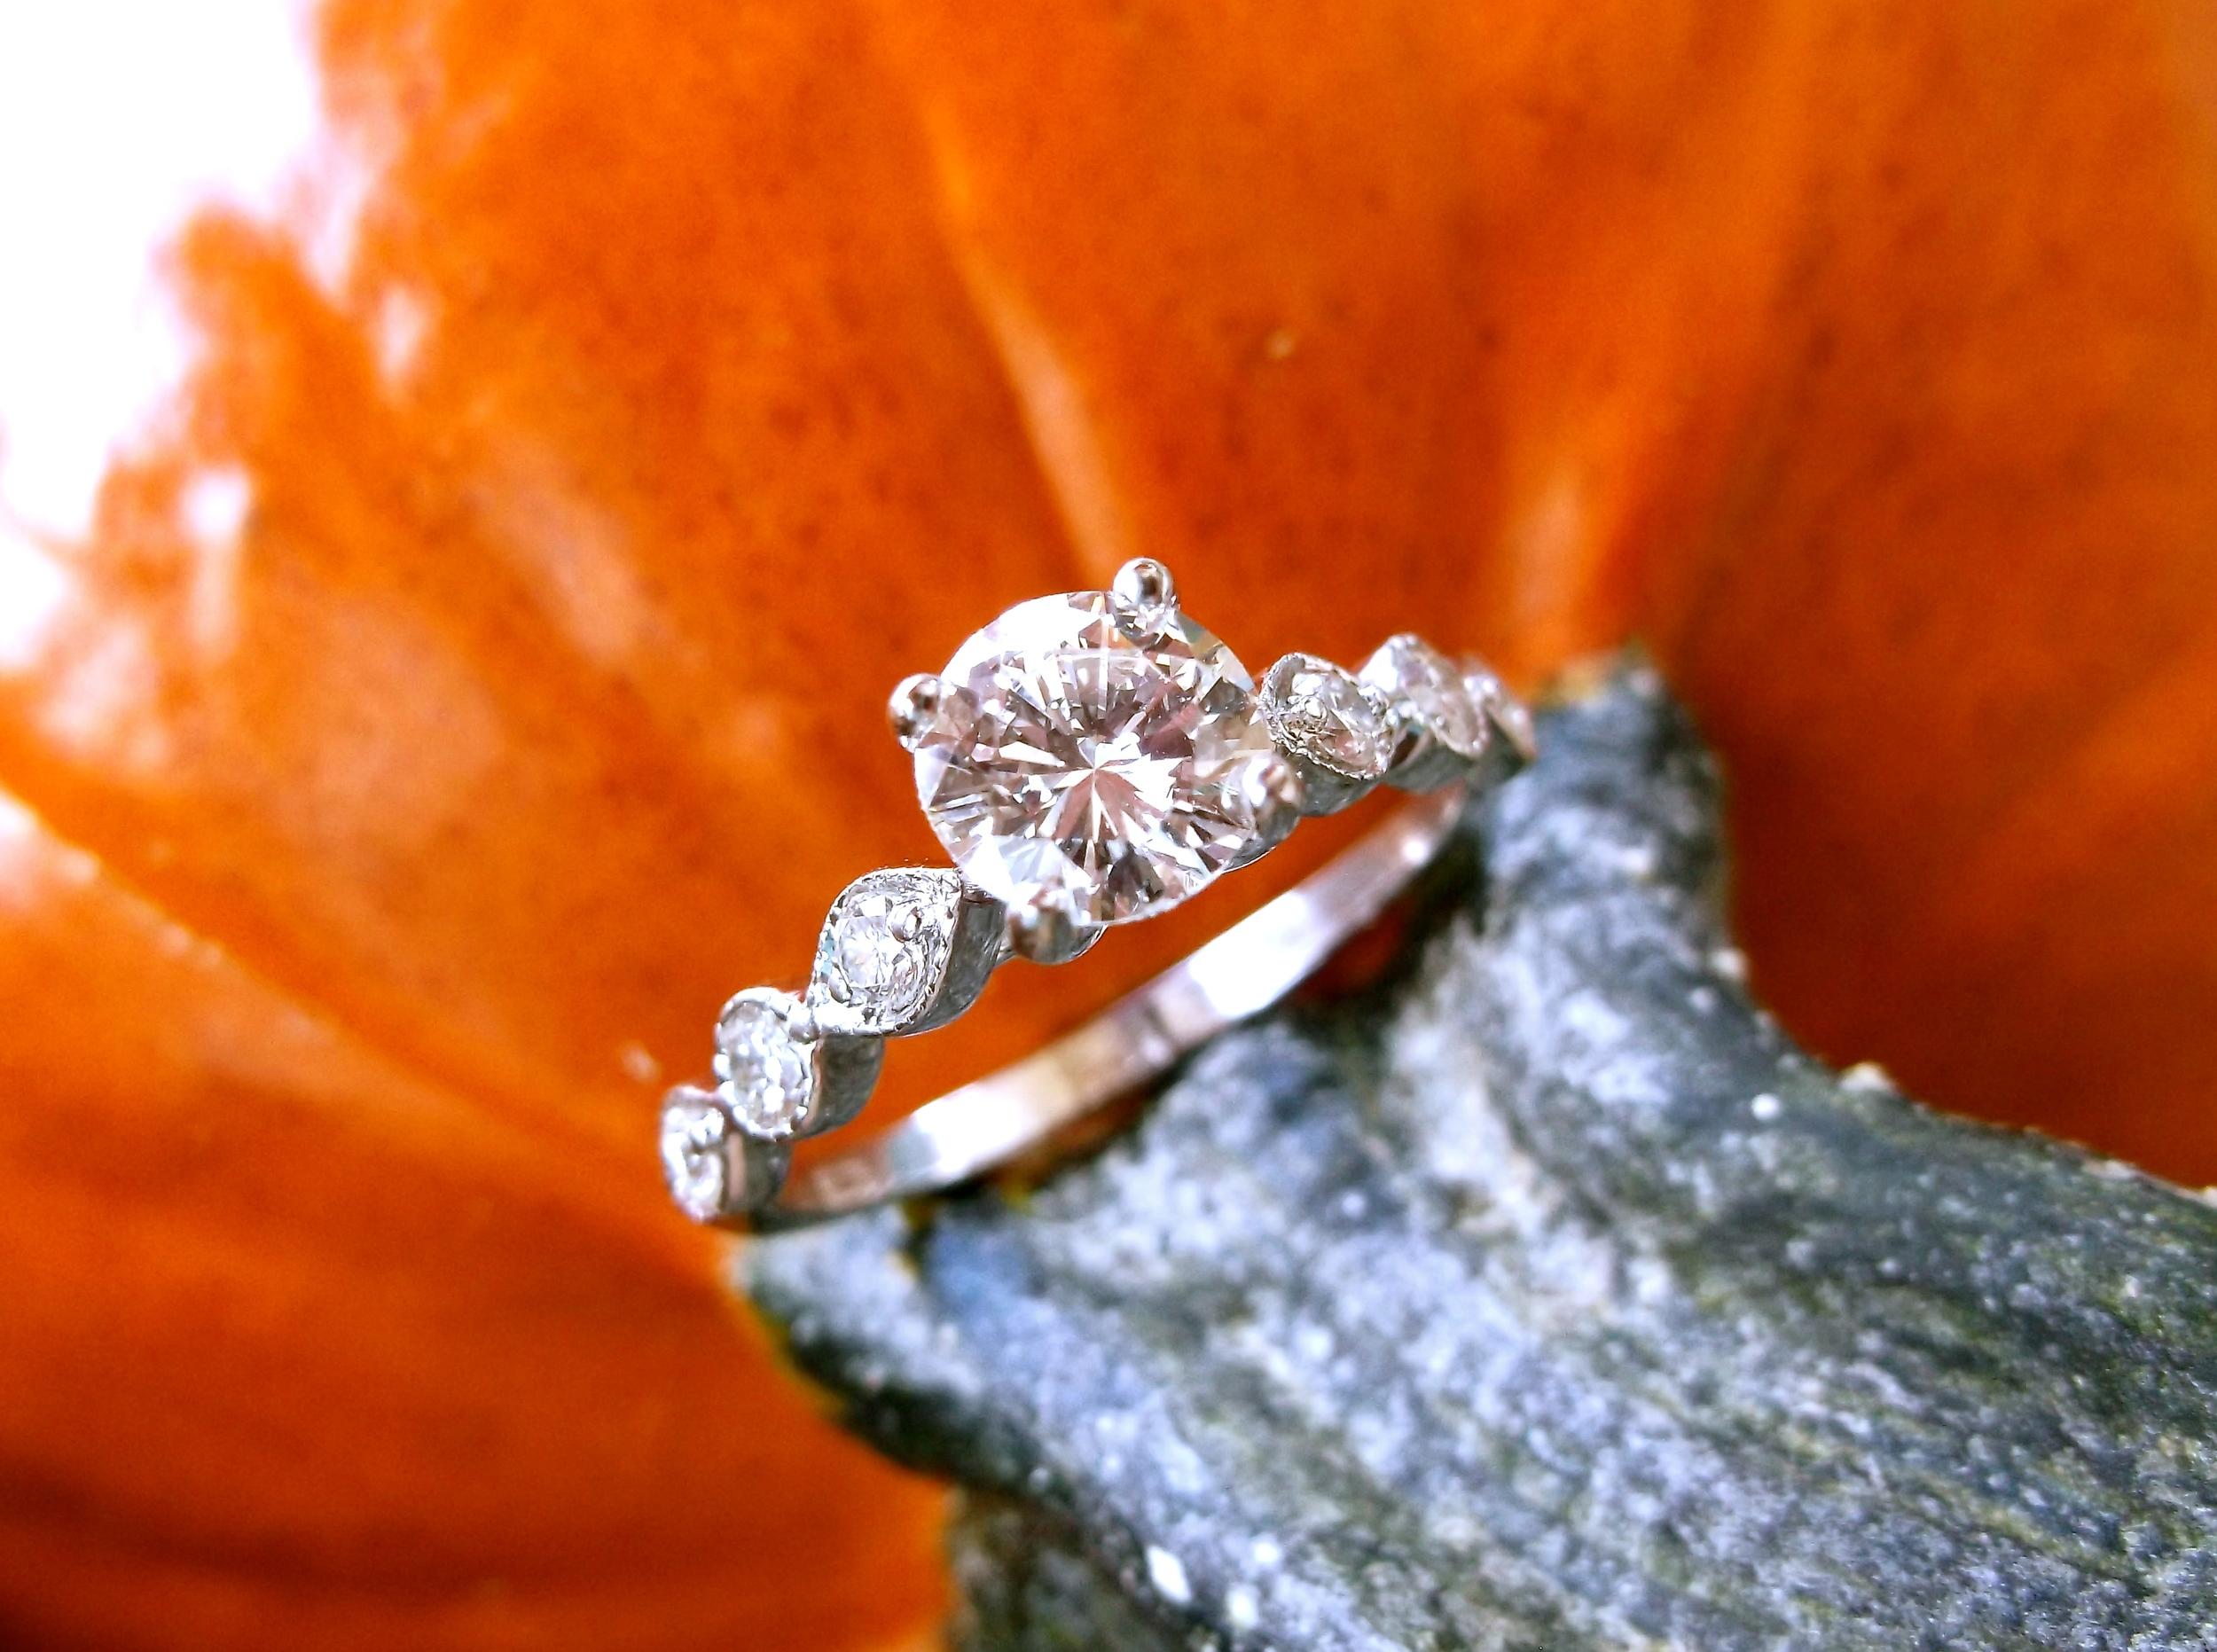 Beautiful 0.70 carat diamond set in a classic white gold and diamond setting.